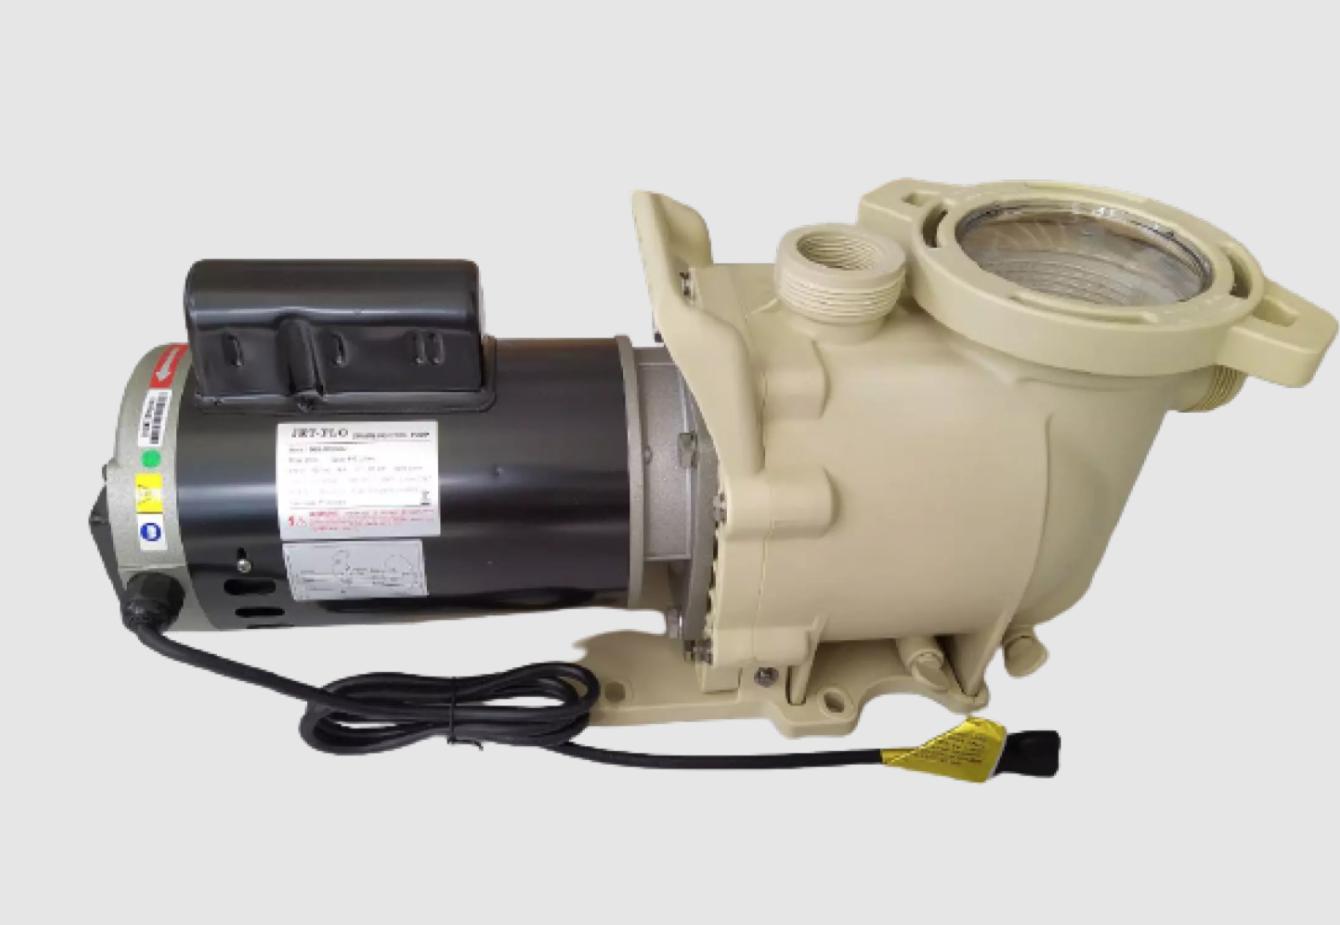 Product details of Jetflo 56SFP250-1 2.5Hp Pool Pump